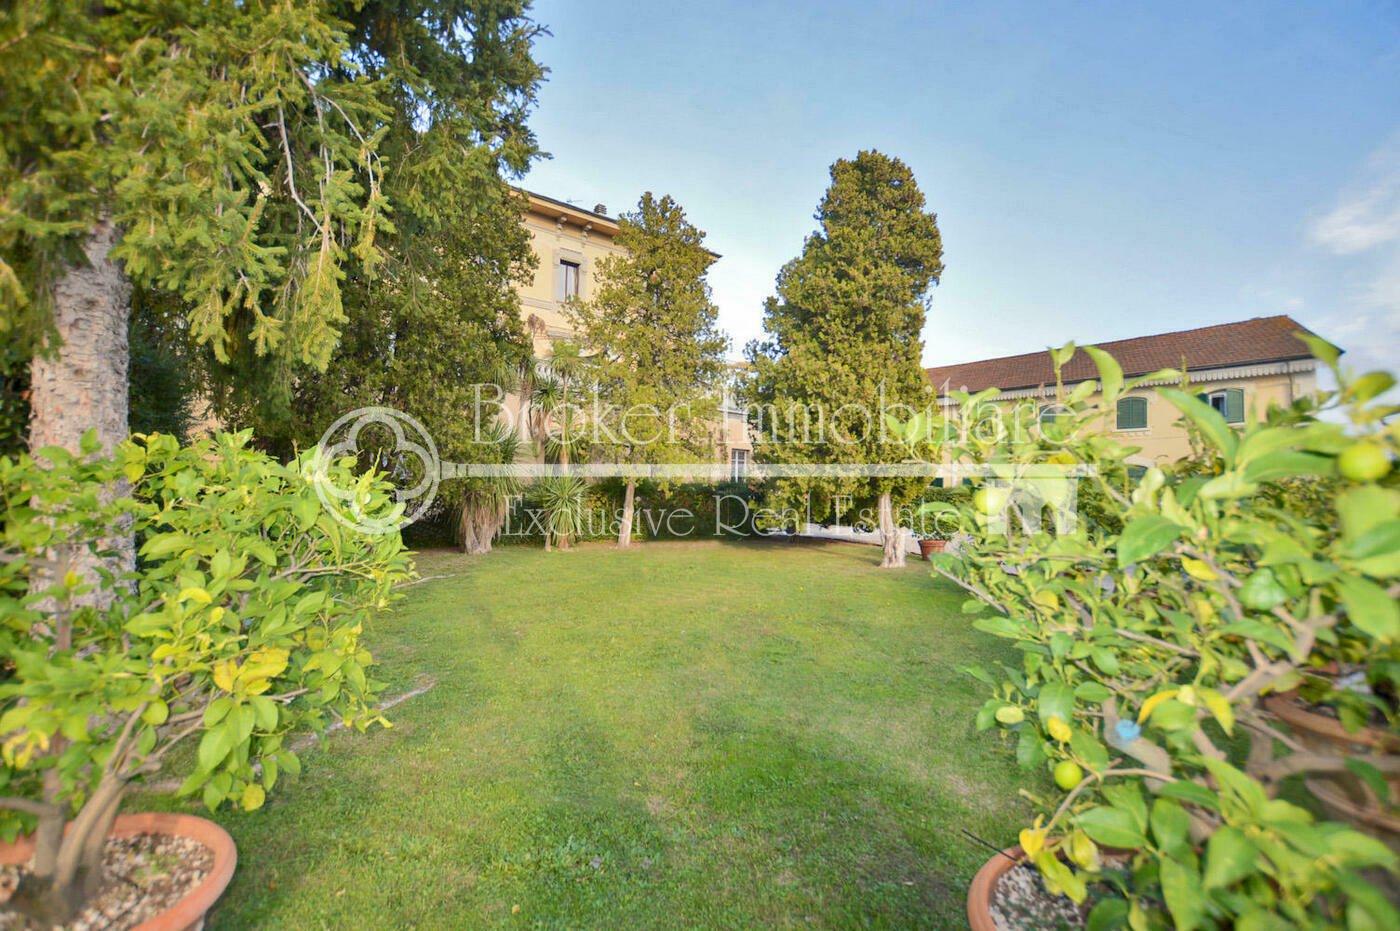 Appartamento a Lucca, Toscana, Italia 1 - 11439840